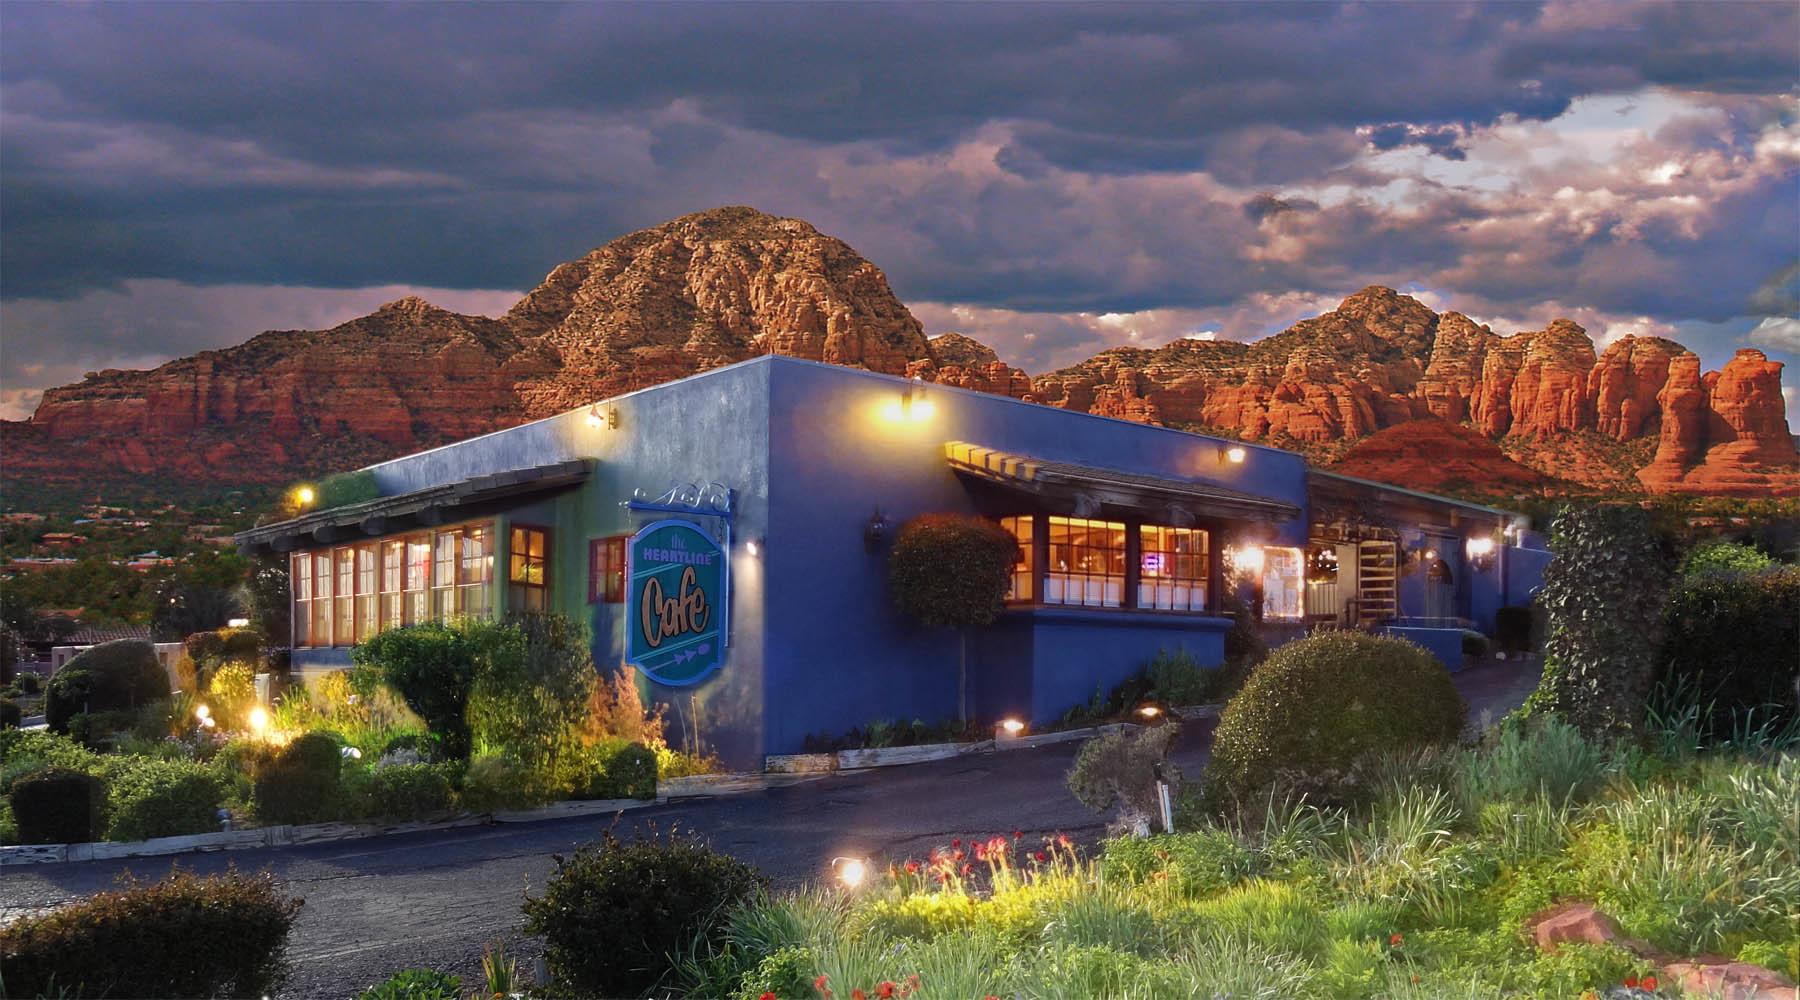 Heartline Cafe, Sedona AZ